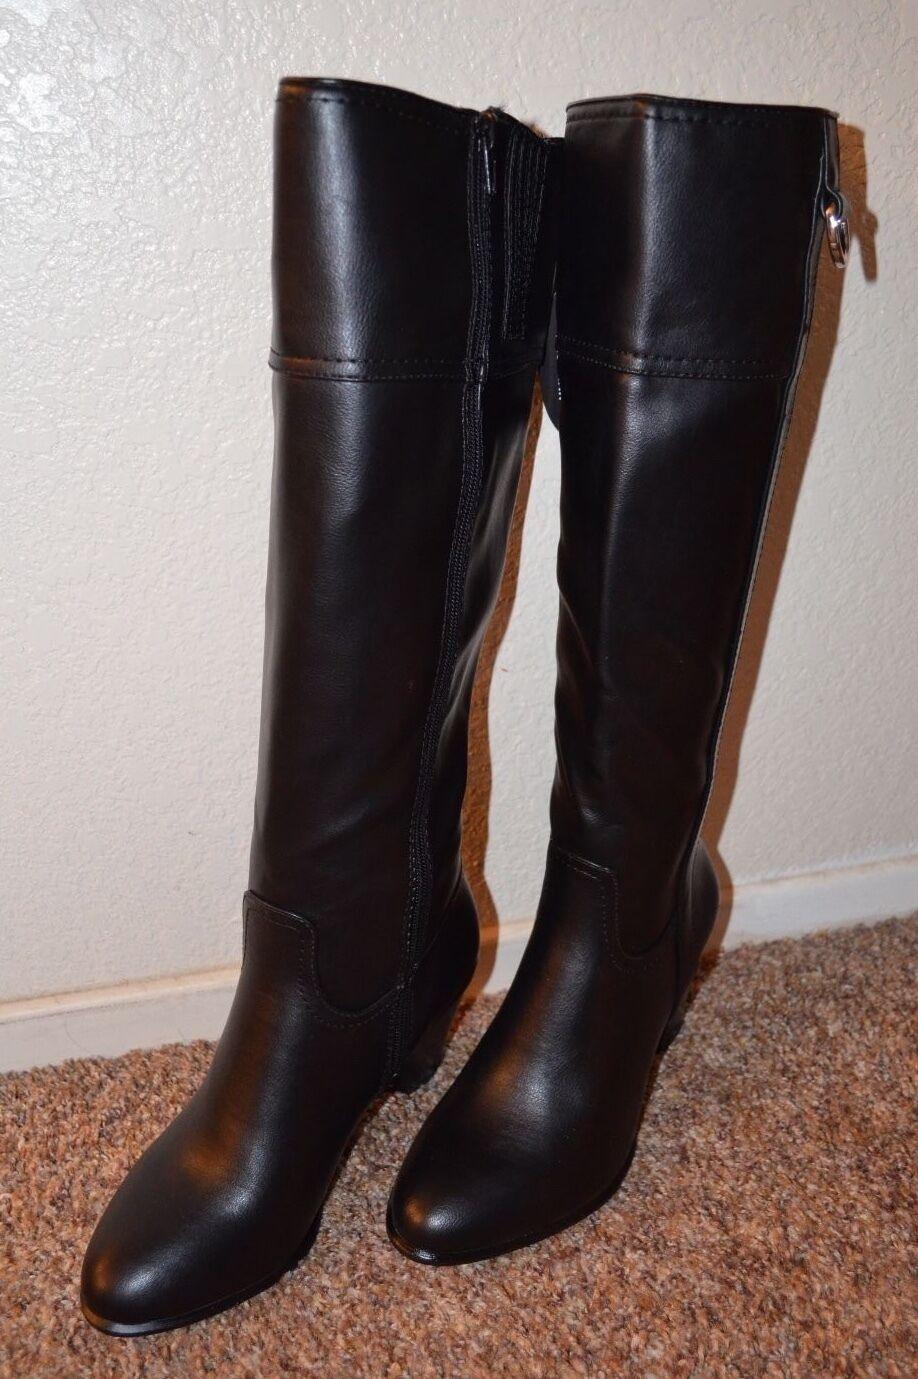 NEW  ALFANI  Women BLACK Knee High Boots   Size 7 m   3  Heel  VERY CUTE